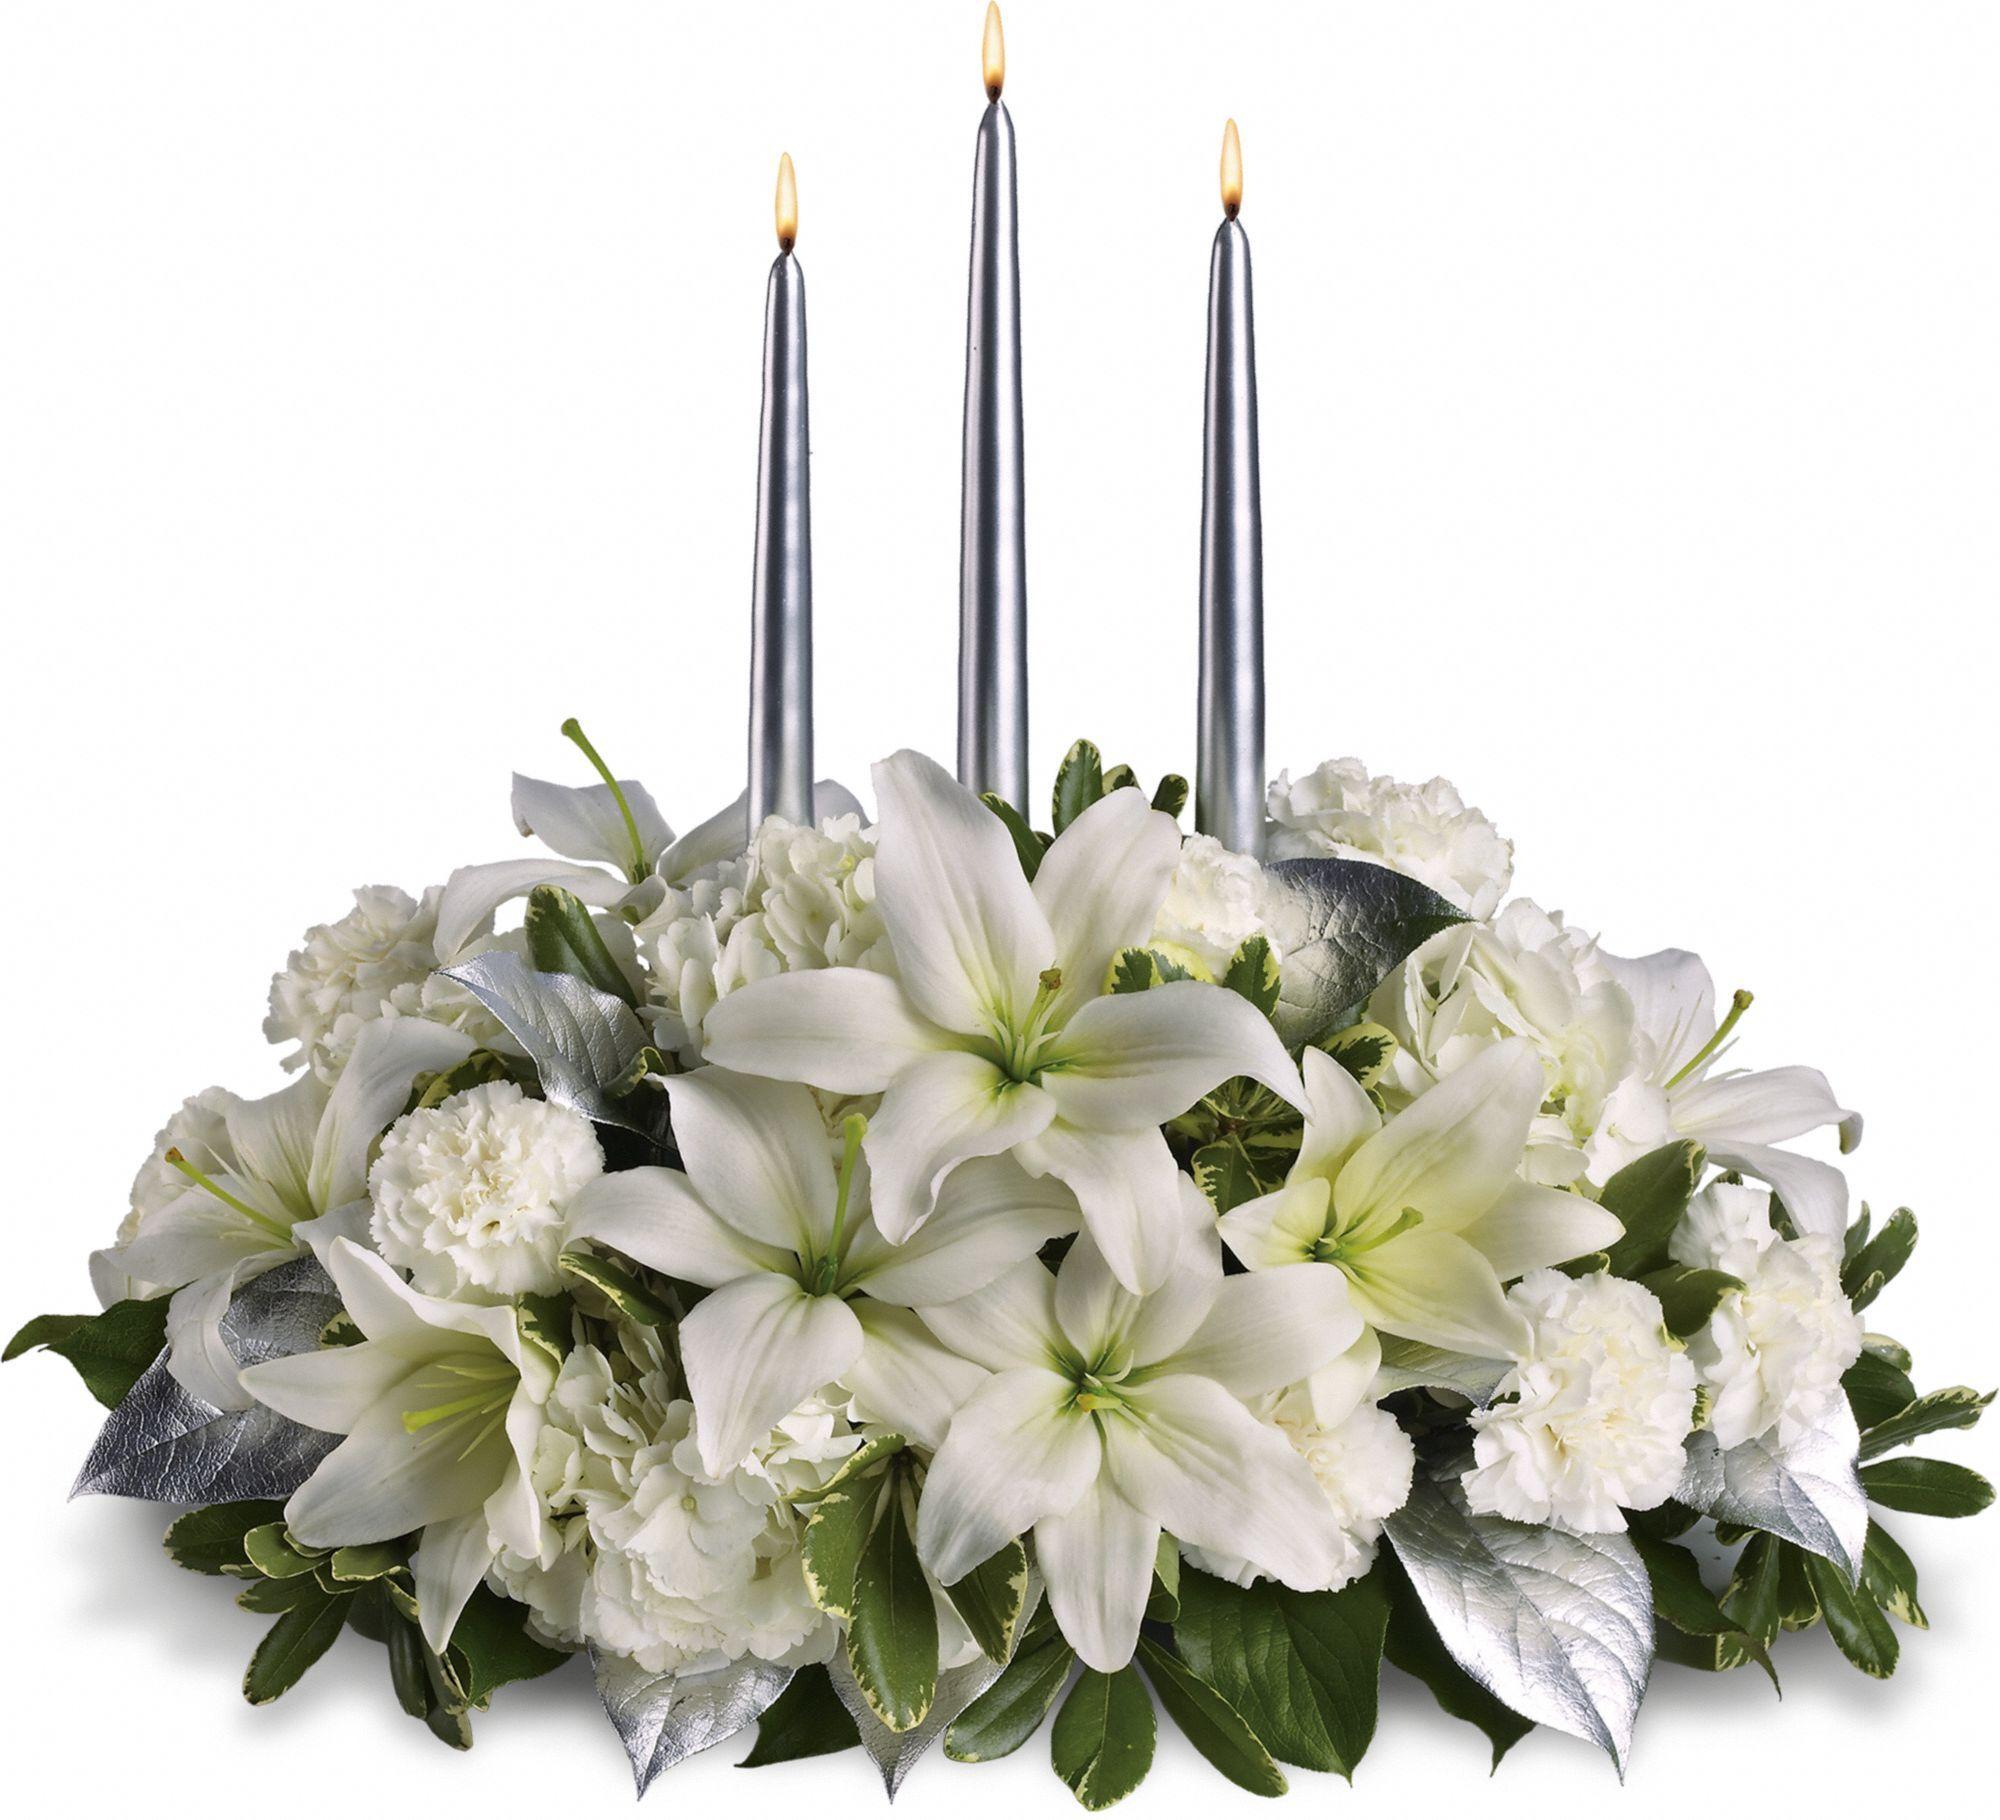 Silver Elegance Centerpiece Christmas flower